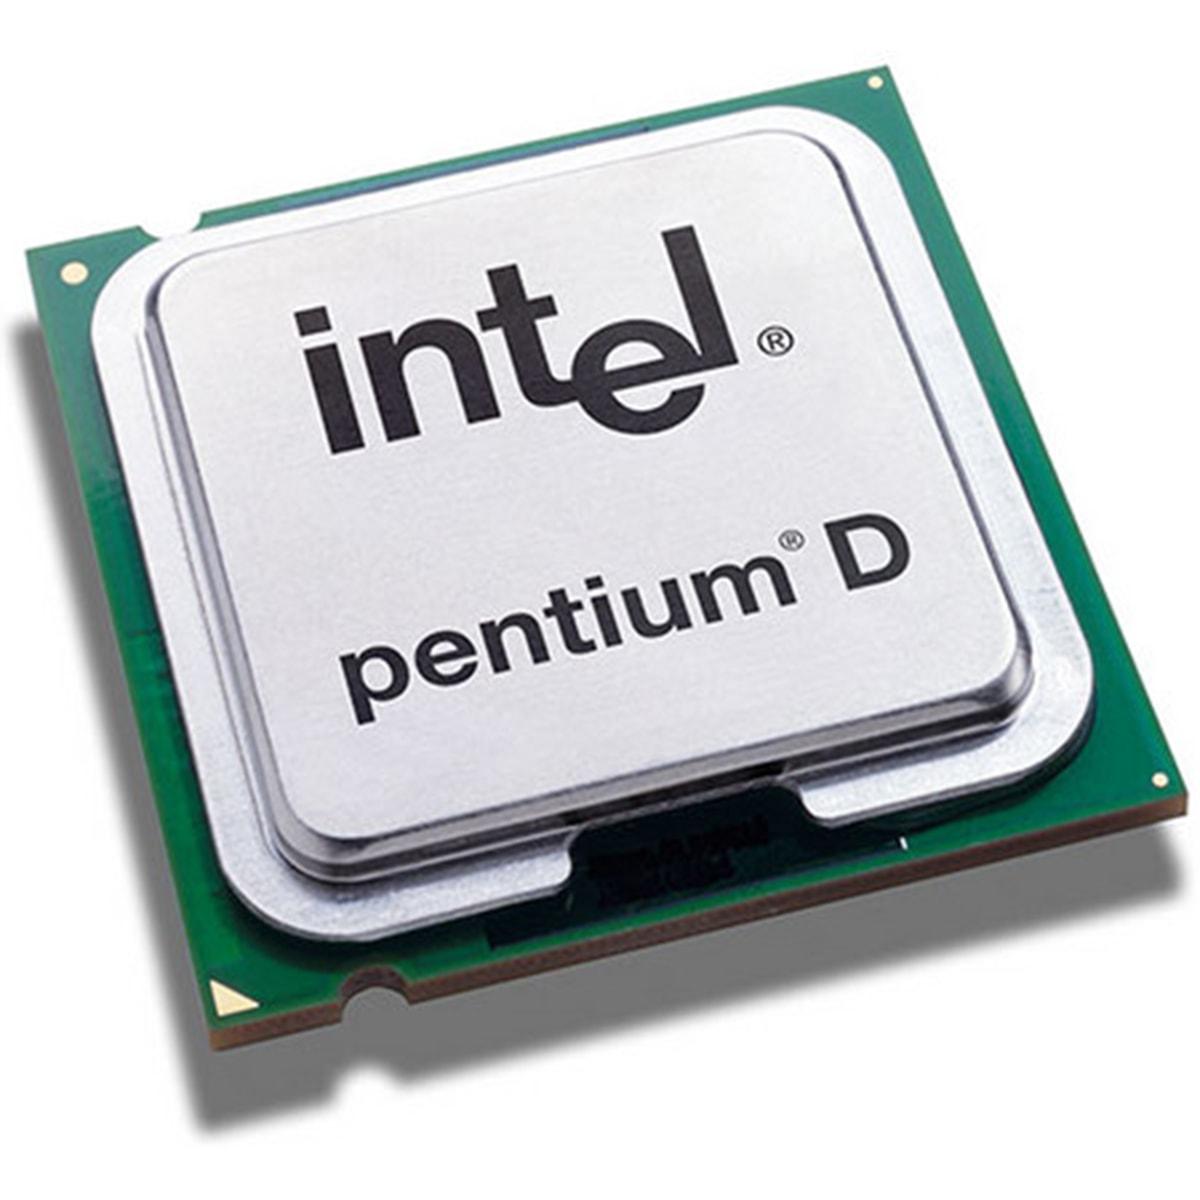 Processador Intel Pentium D 805 2,66Ghz 2M Cache 533MHz - Socket 775 - Seminovo